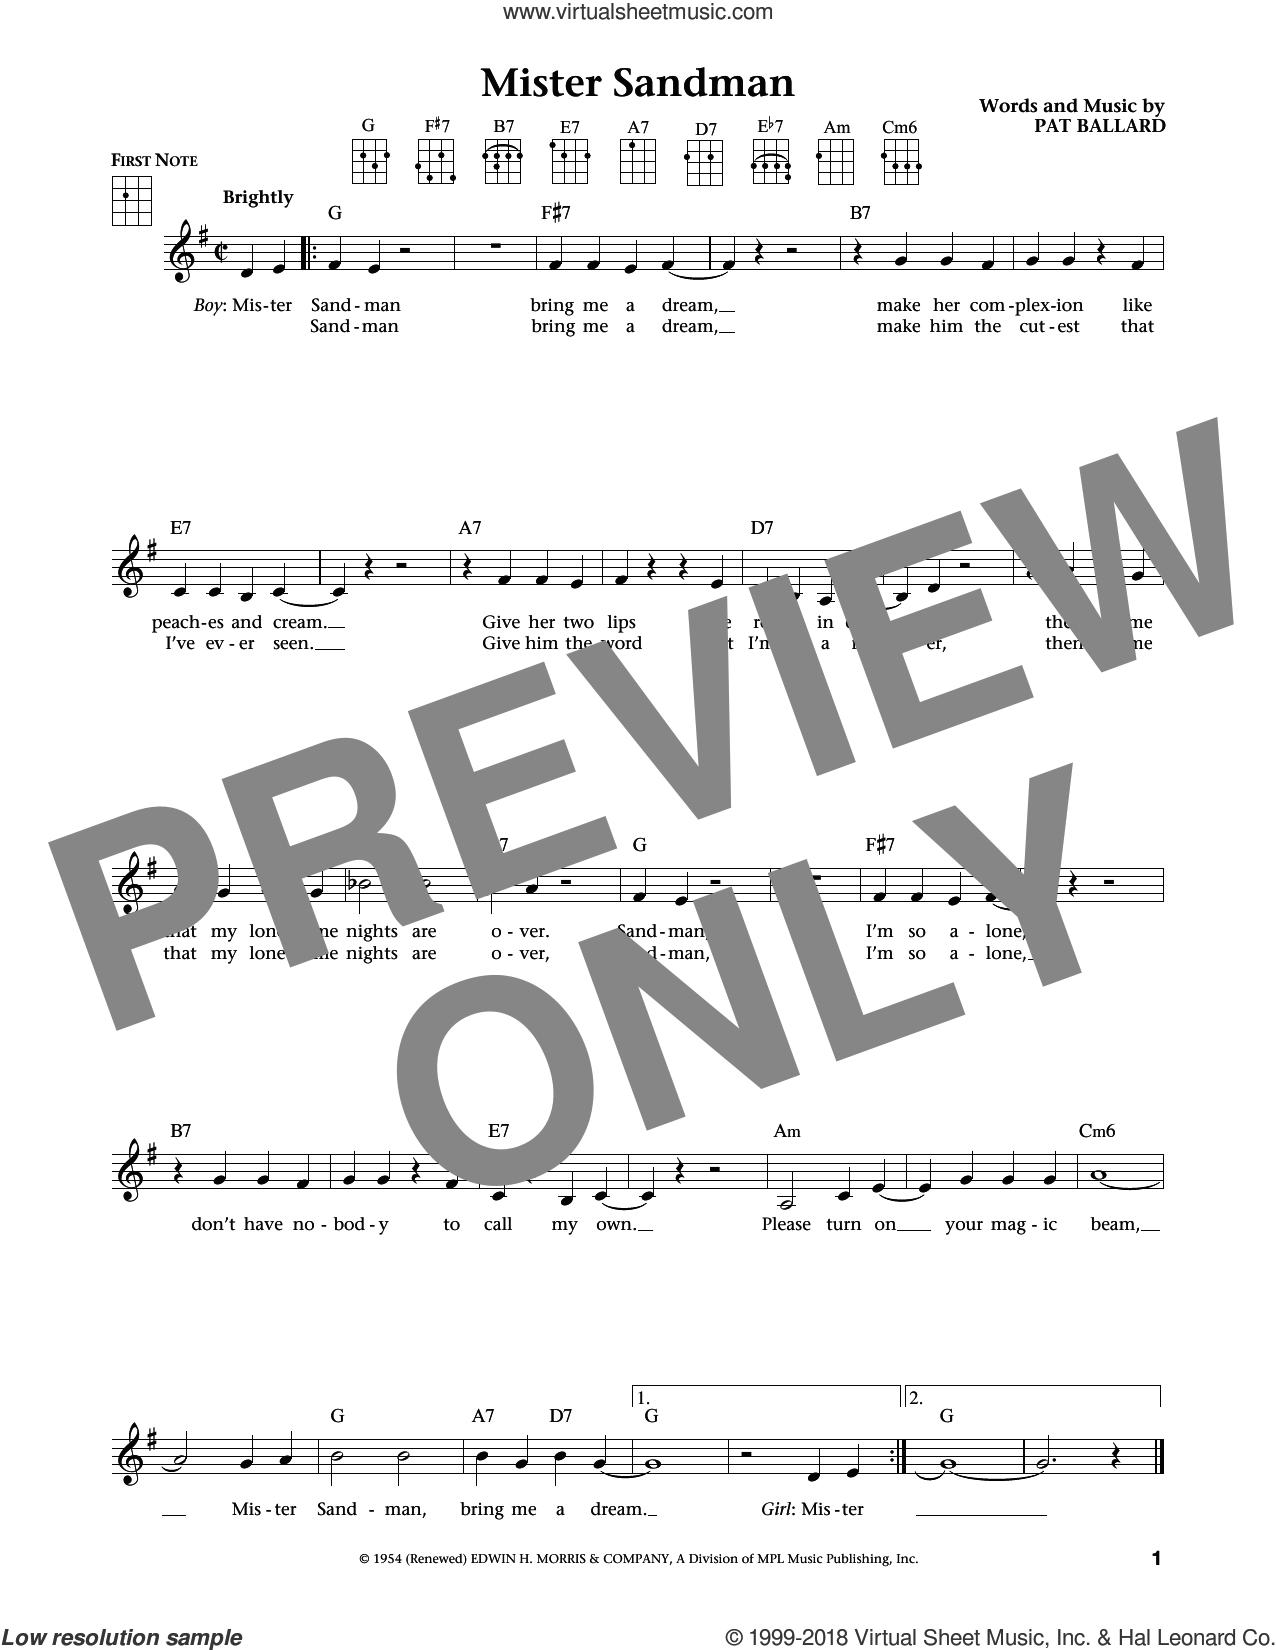 Mister Sandman (from The Daily Ukulele) (arr. Liz and Jim Beloff) sheet music for ukulele by The Chordettes, Jim Beloff, Liz Beloff and Pat Ballard, intermediate skill level